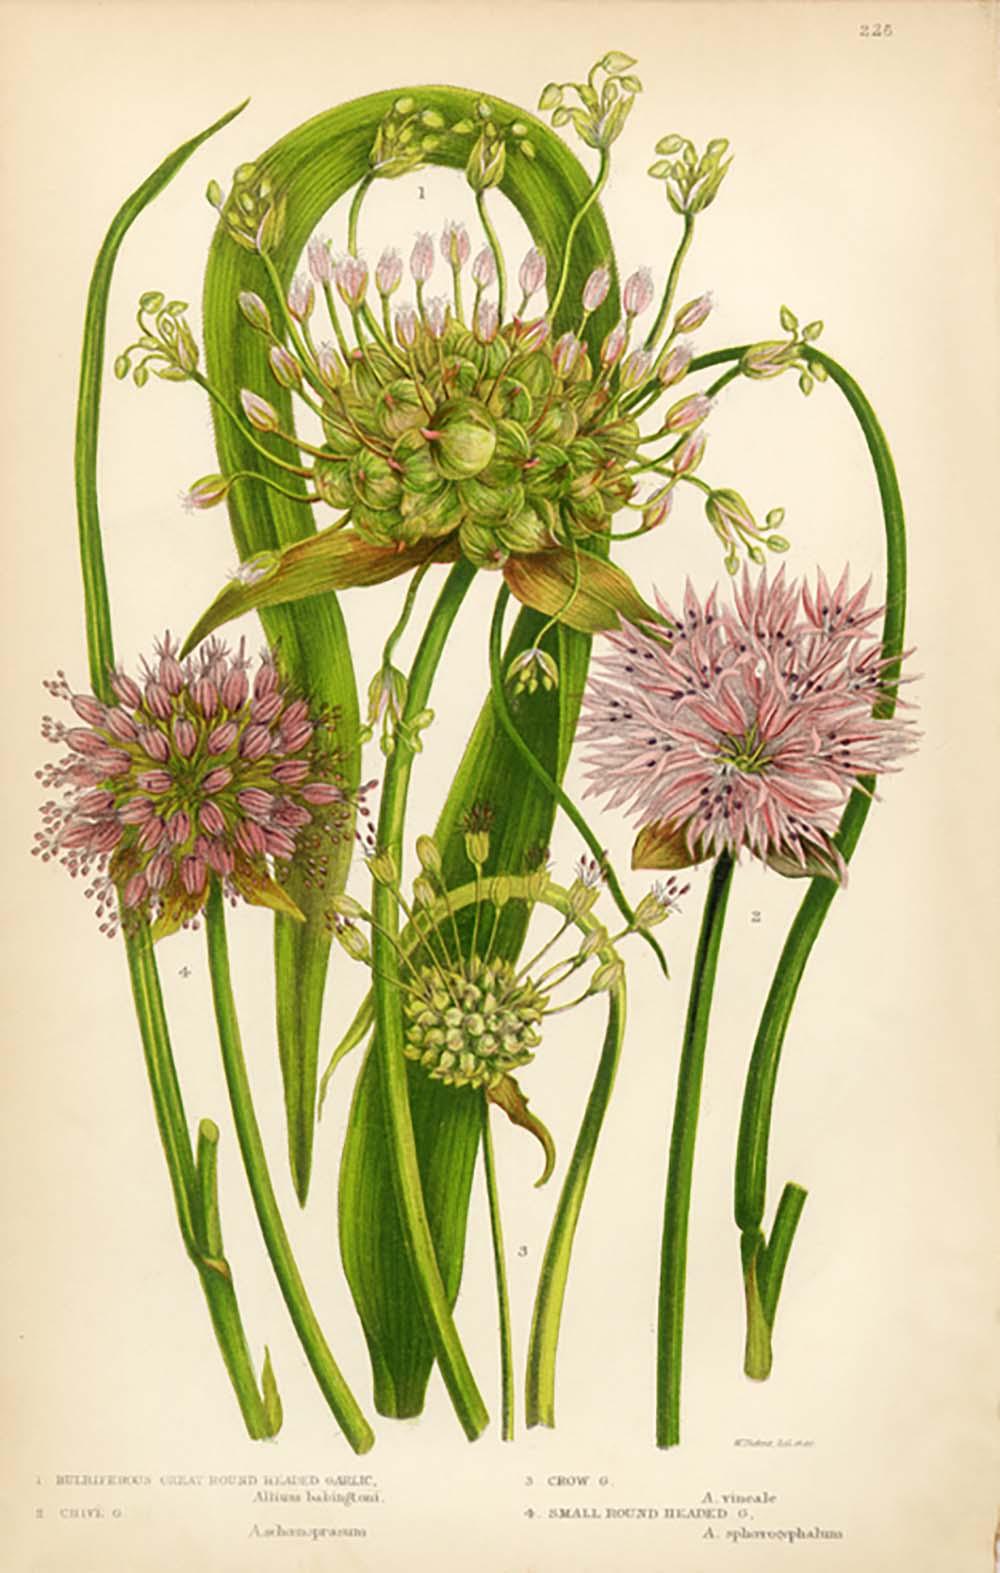 herbs-to-help-your-health-garlic